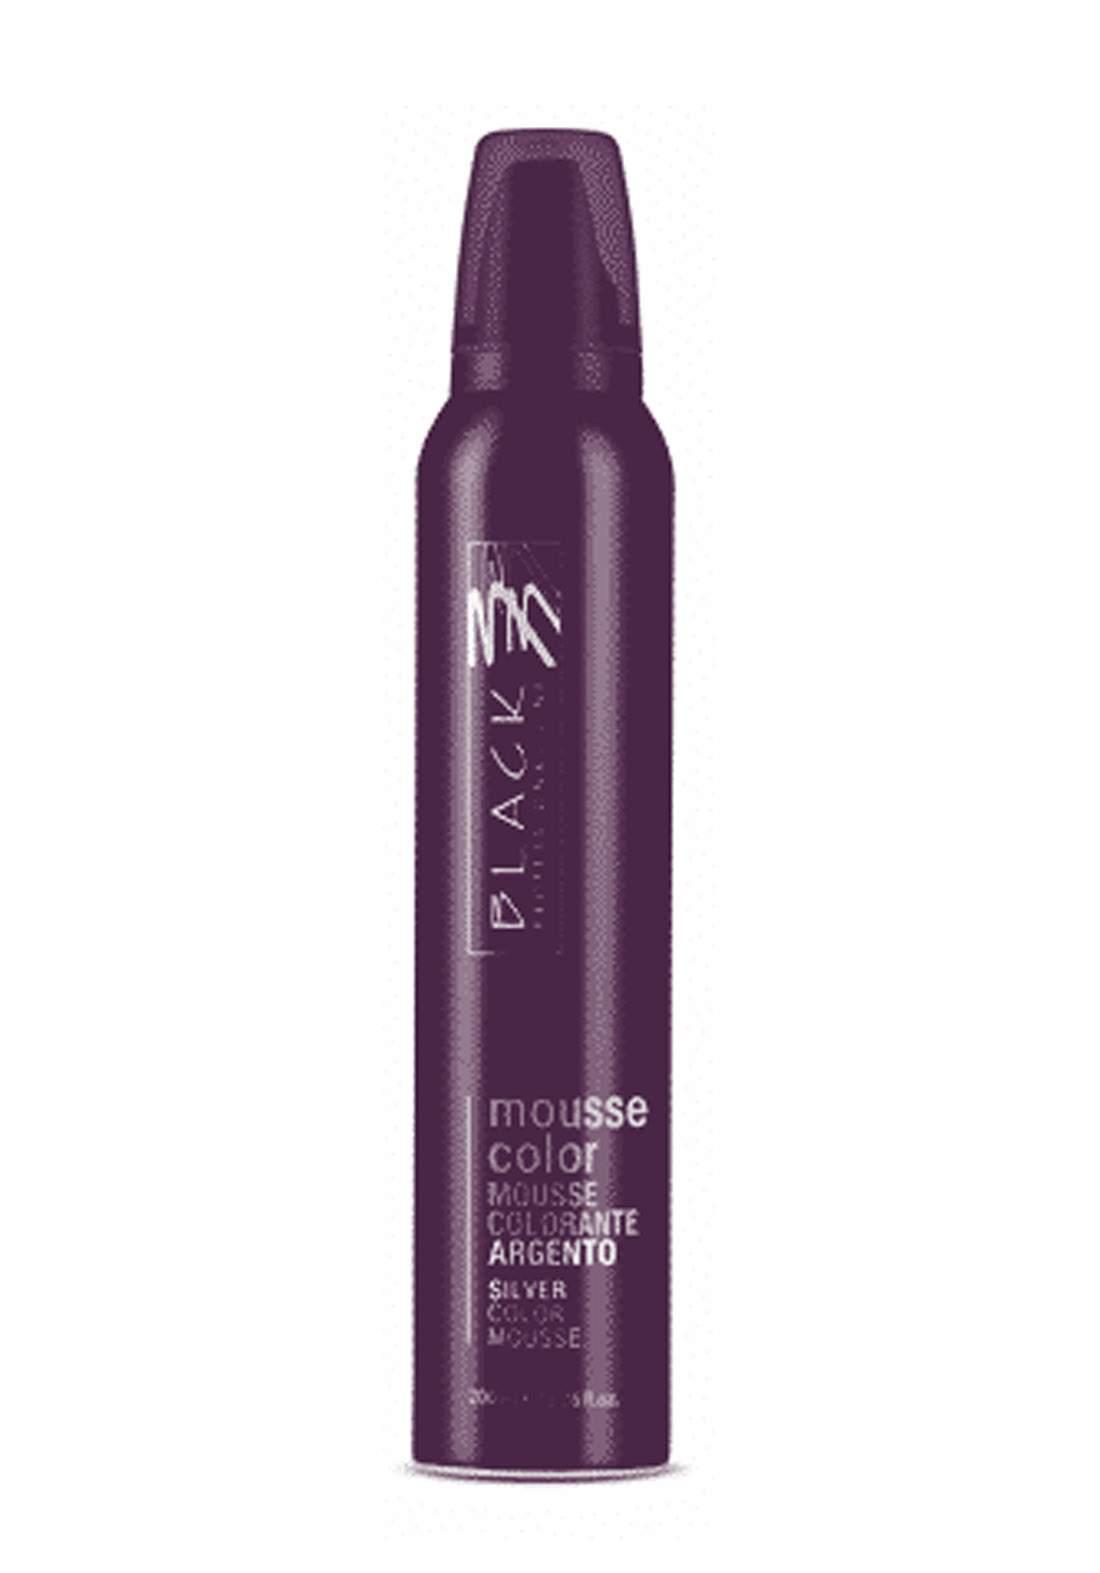 Black Mousse Color Protective Coloring 200ml Silver  موس حماية اللون